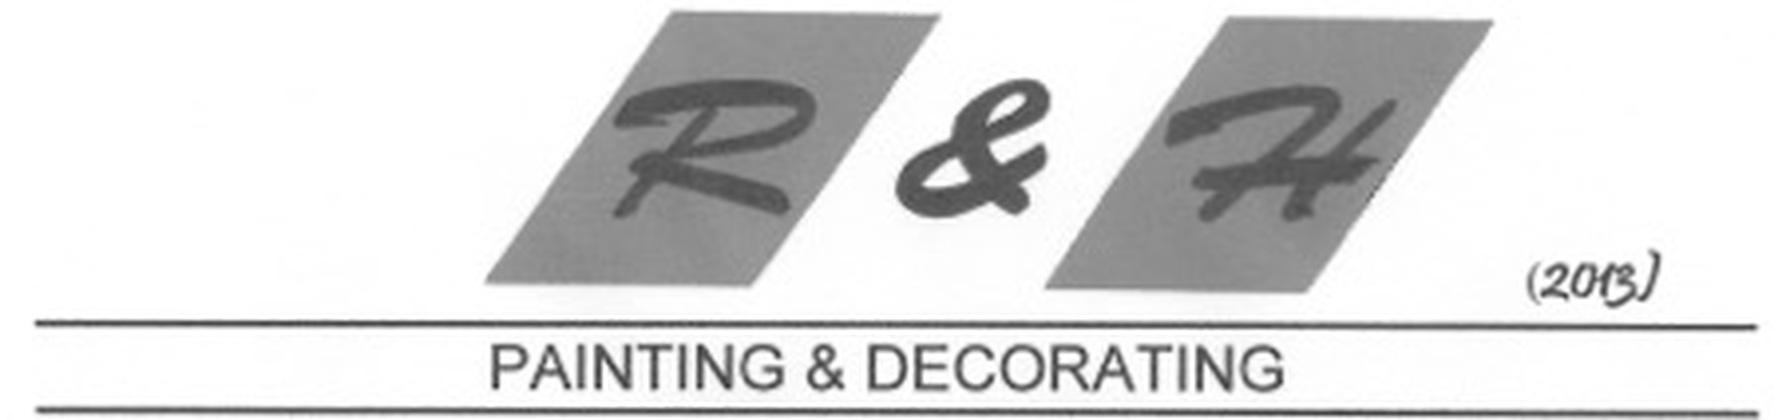 R&H (2013) Painting & Decorating Ltd.